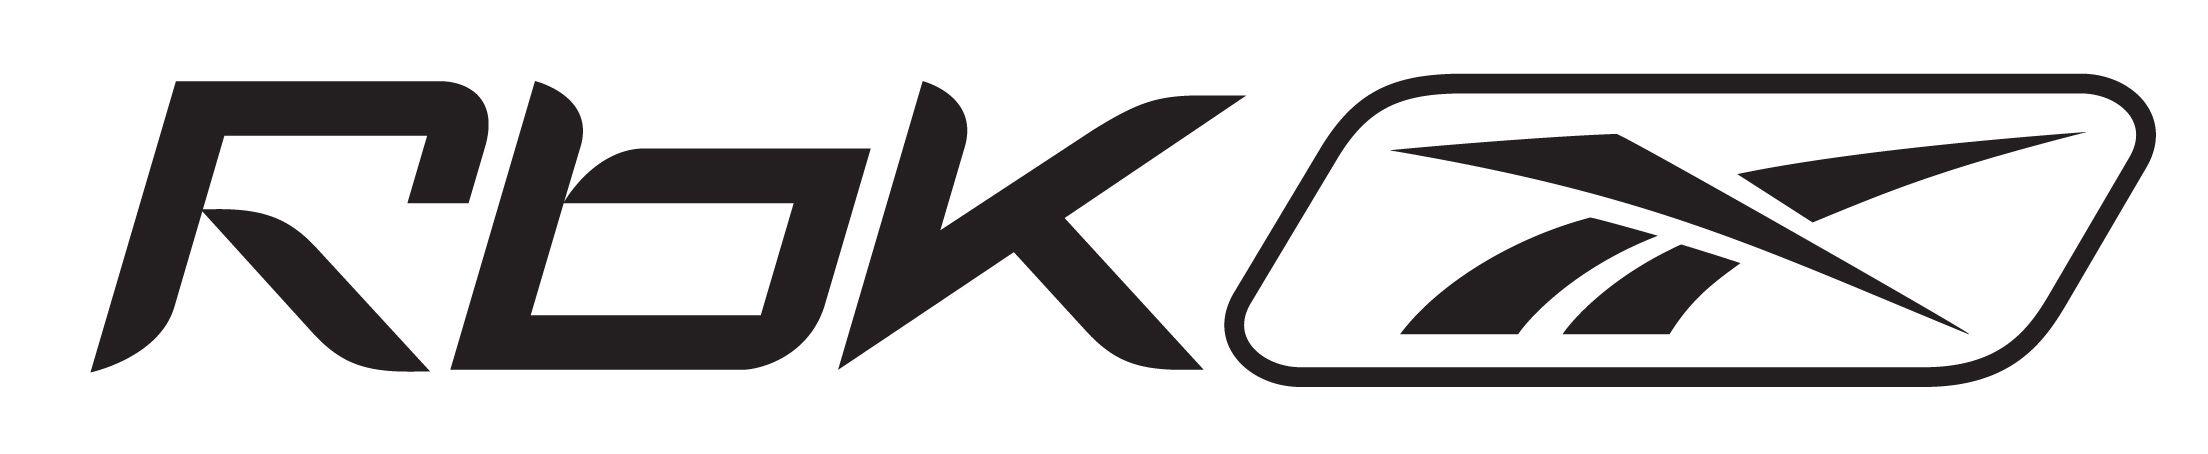 Reebok brands pinterest reebok logos and company logo reebok buycottarizona Image collections